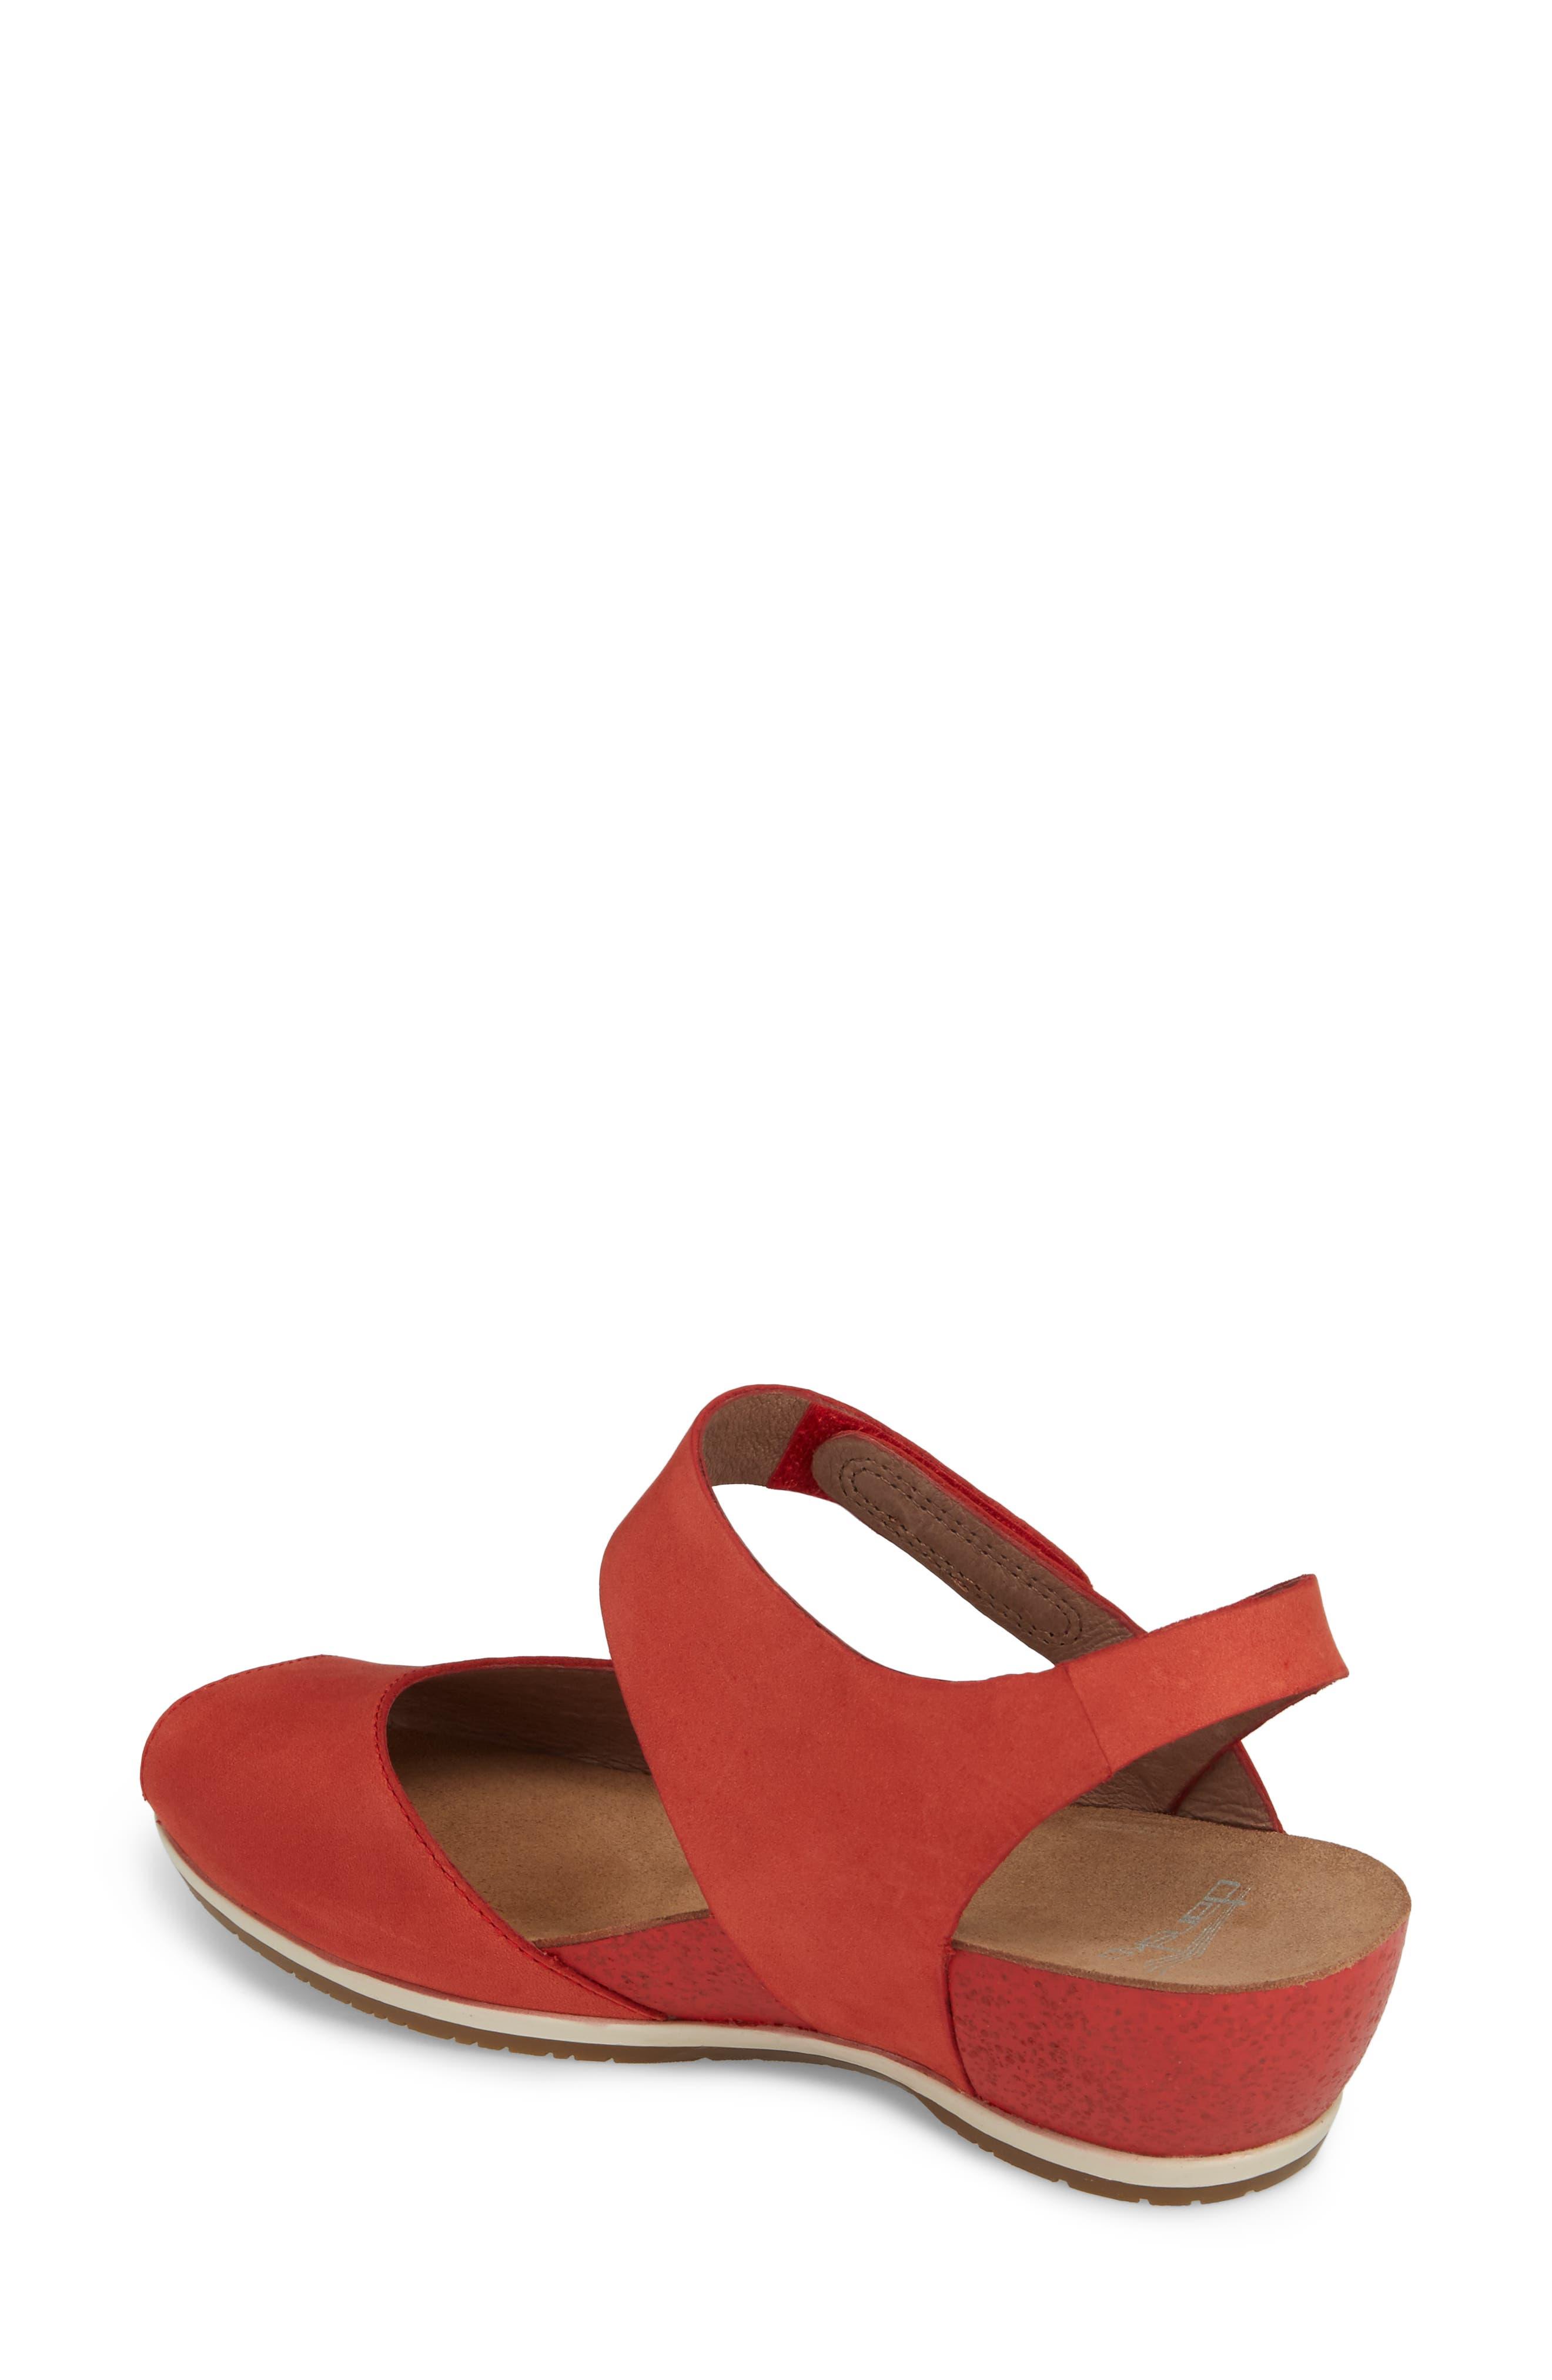 Vera Sandal,                             Alternate thumbnail 2, color,                             Tomato Milled Nubuck Leather